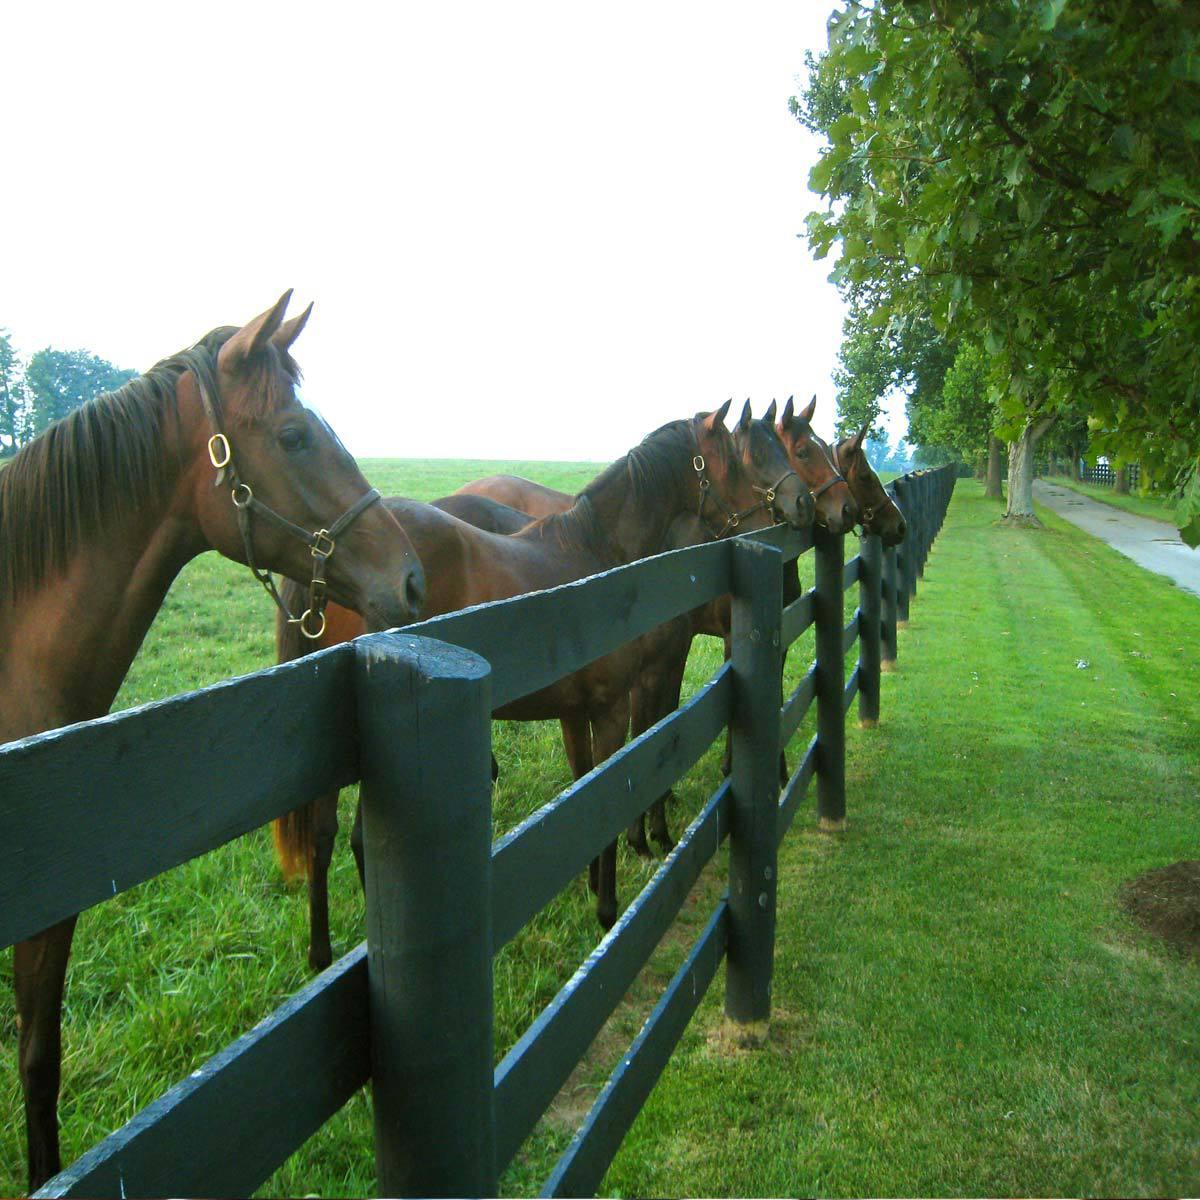 horses-at-fence.jpg